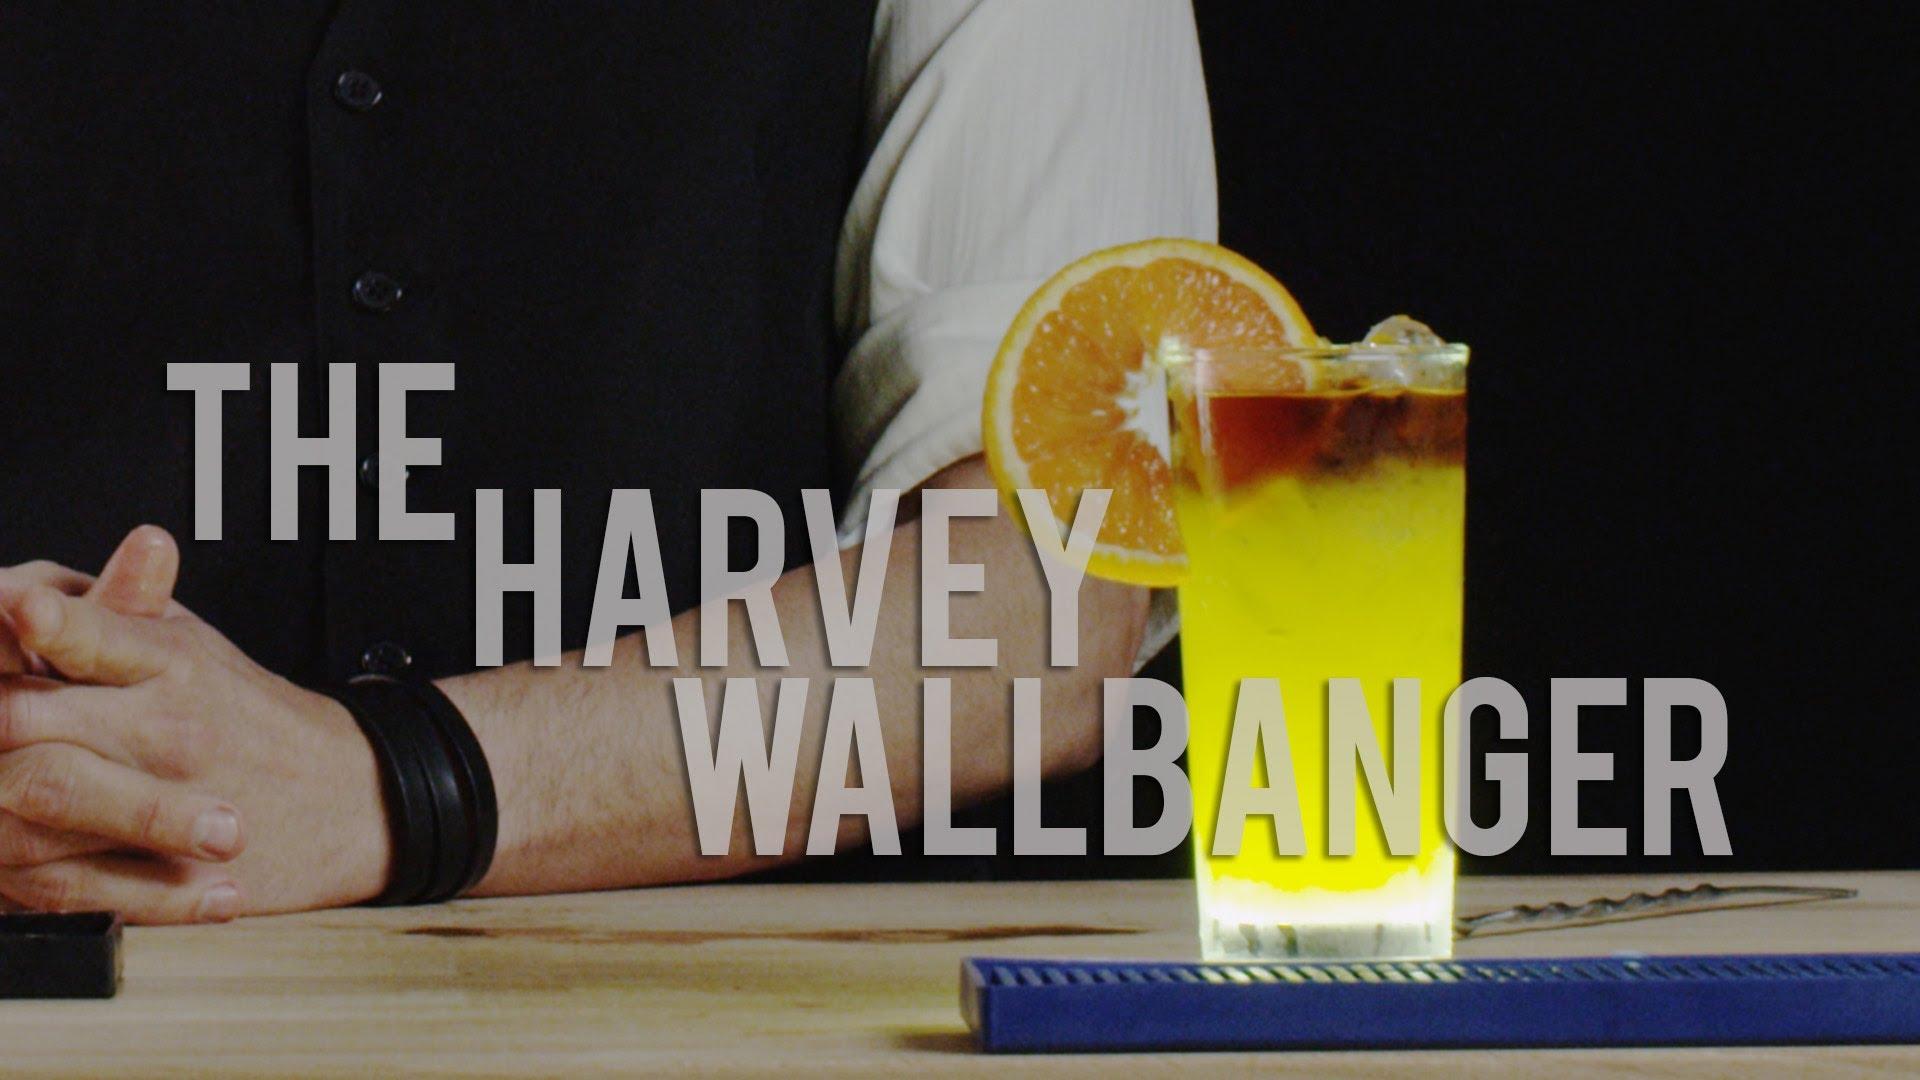 Nice wallpapers Harvey Wallbanger 1920x1080px